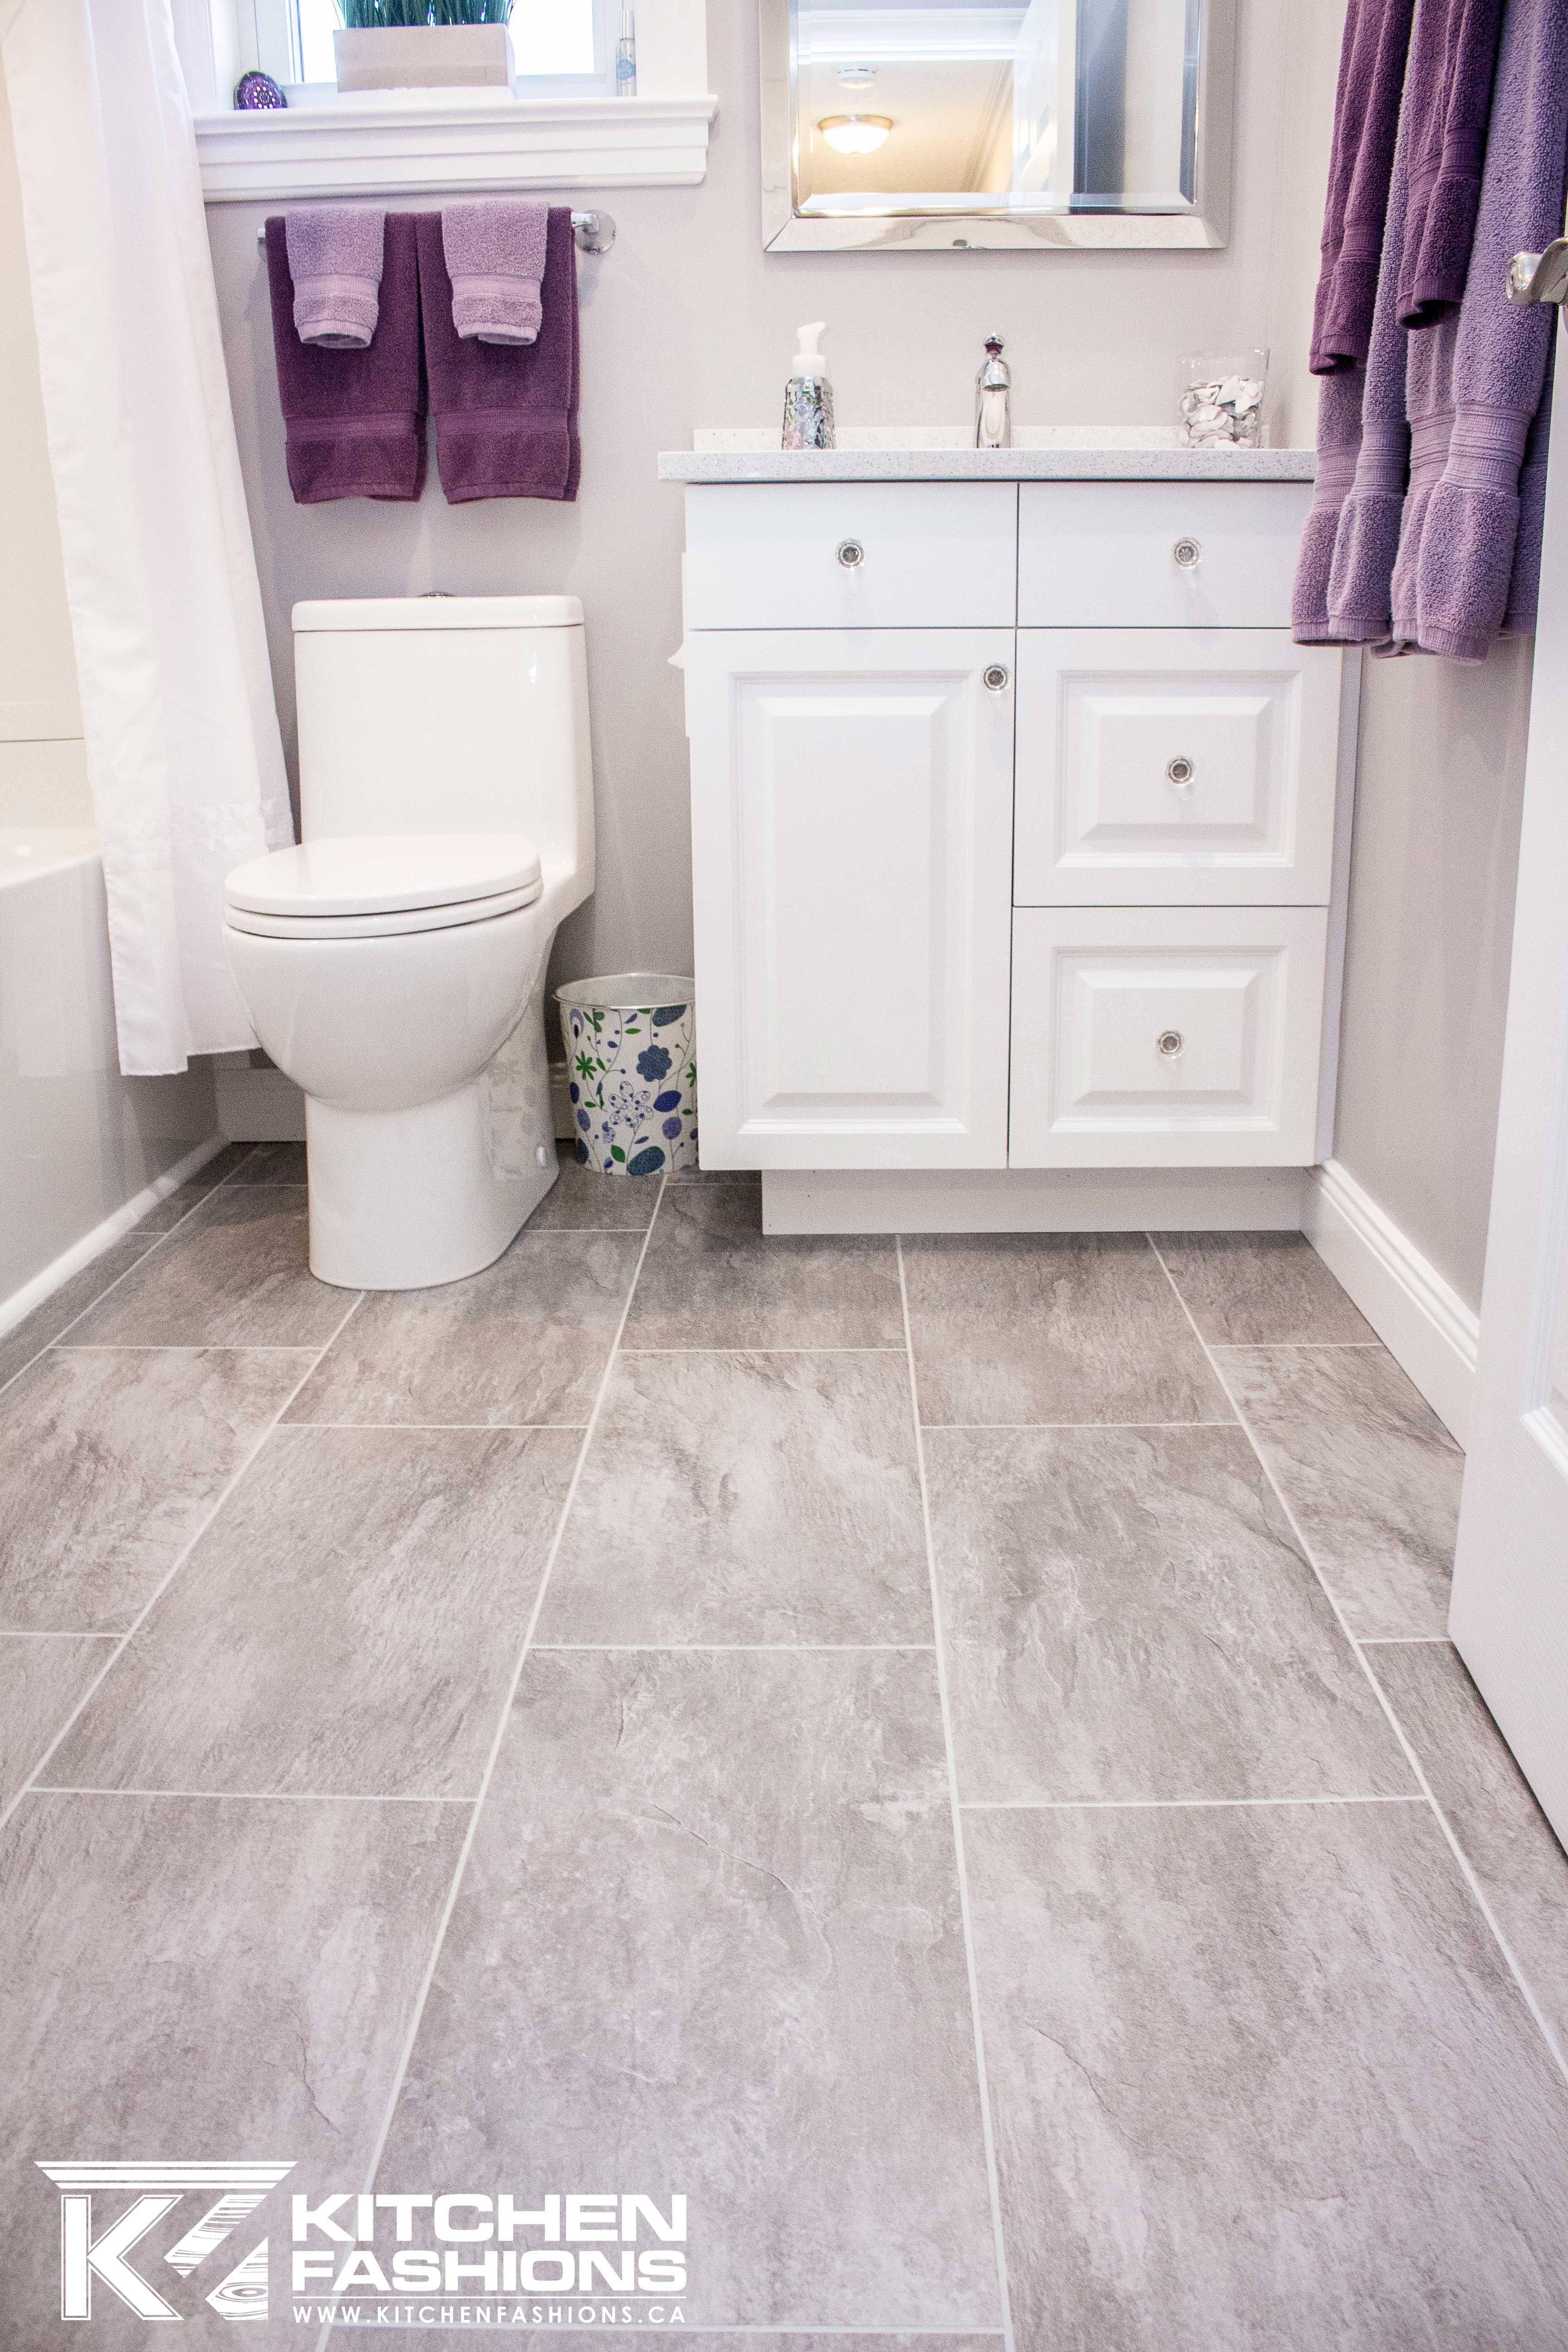 Bathroom Is White Grey And Purple Grey Lvt Flooring Lavender Towels Neutral Bathroom Decor Grey Bathrooms Toilet For Small Bathroom